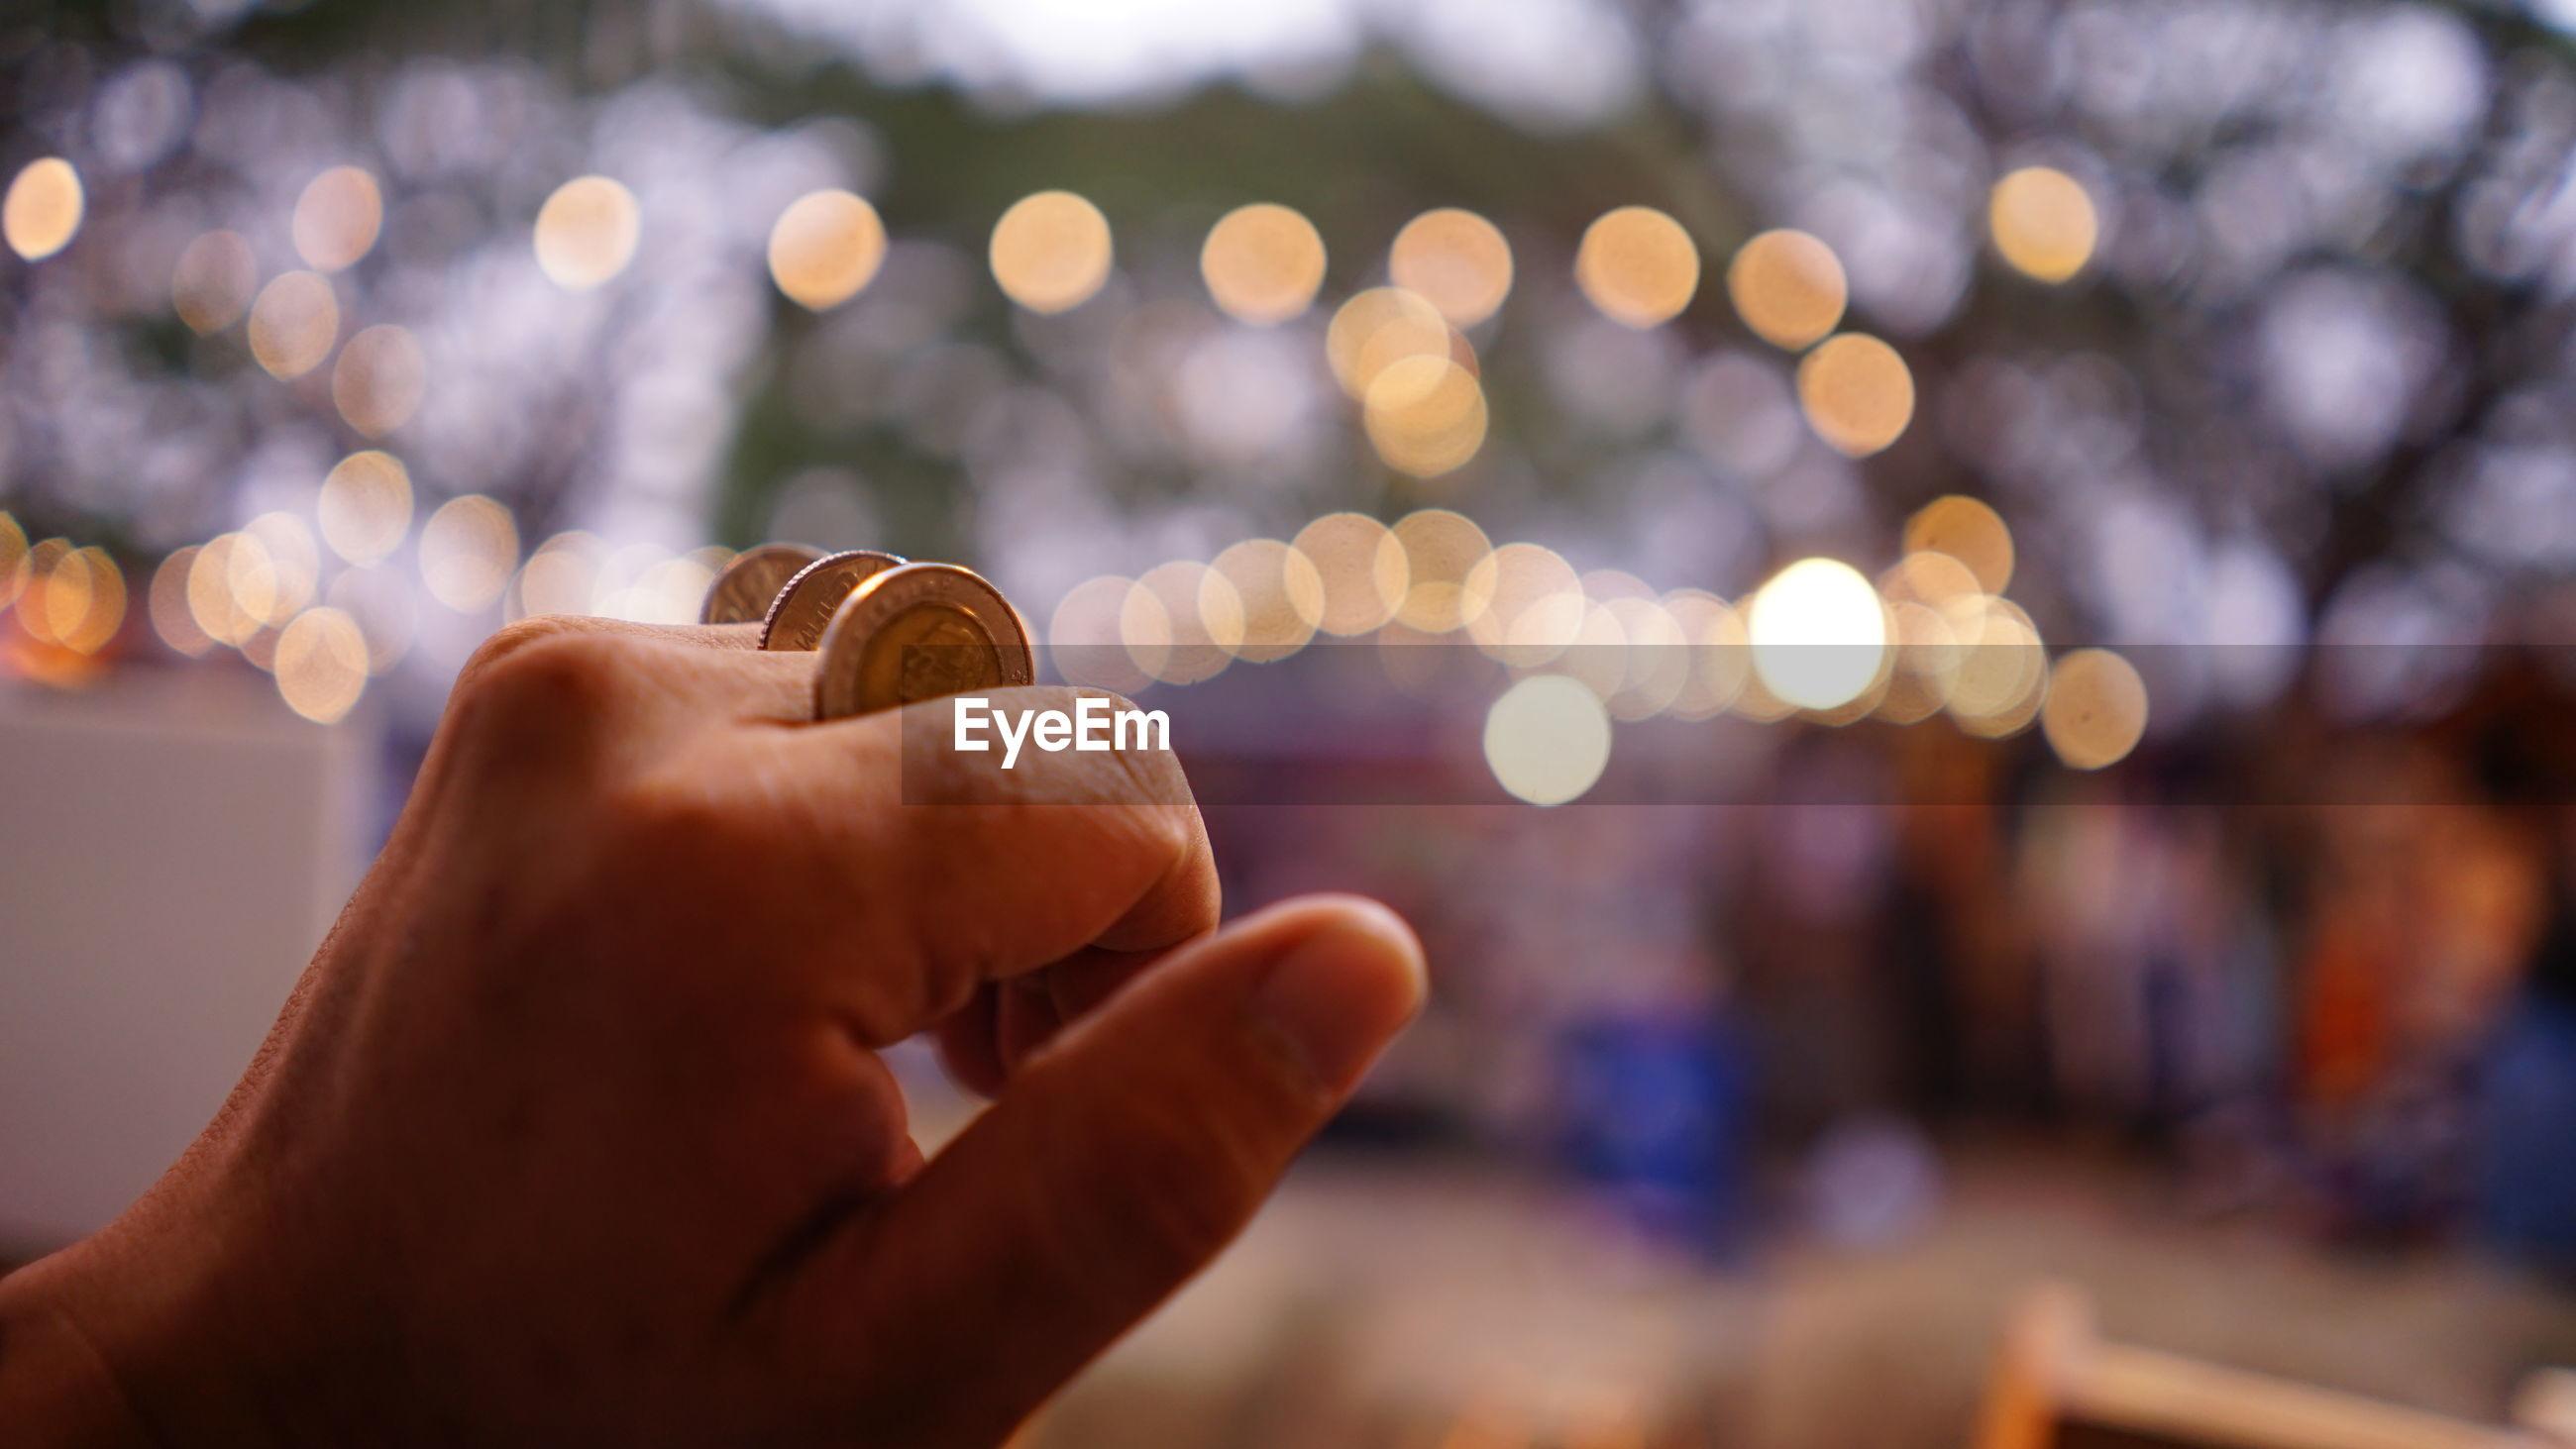 Close-up of hand holding illuminated blurred lights